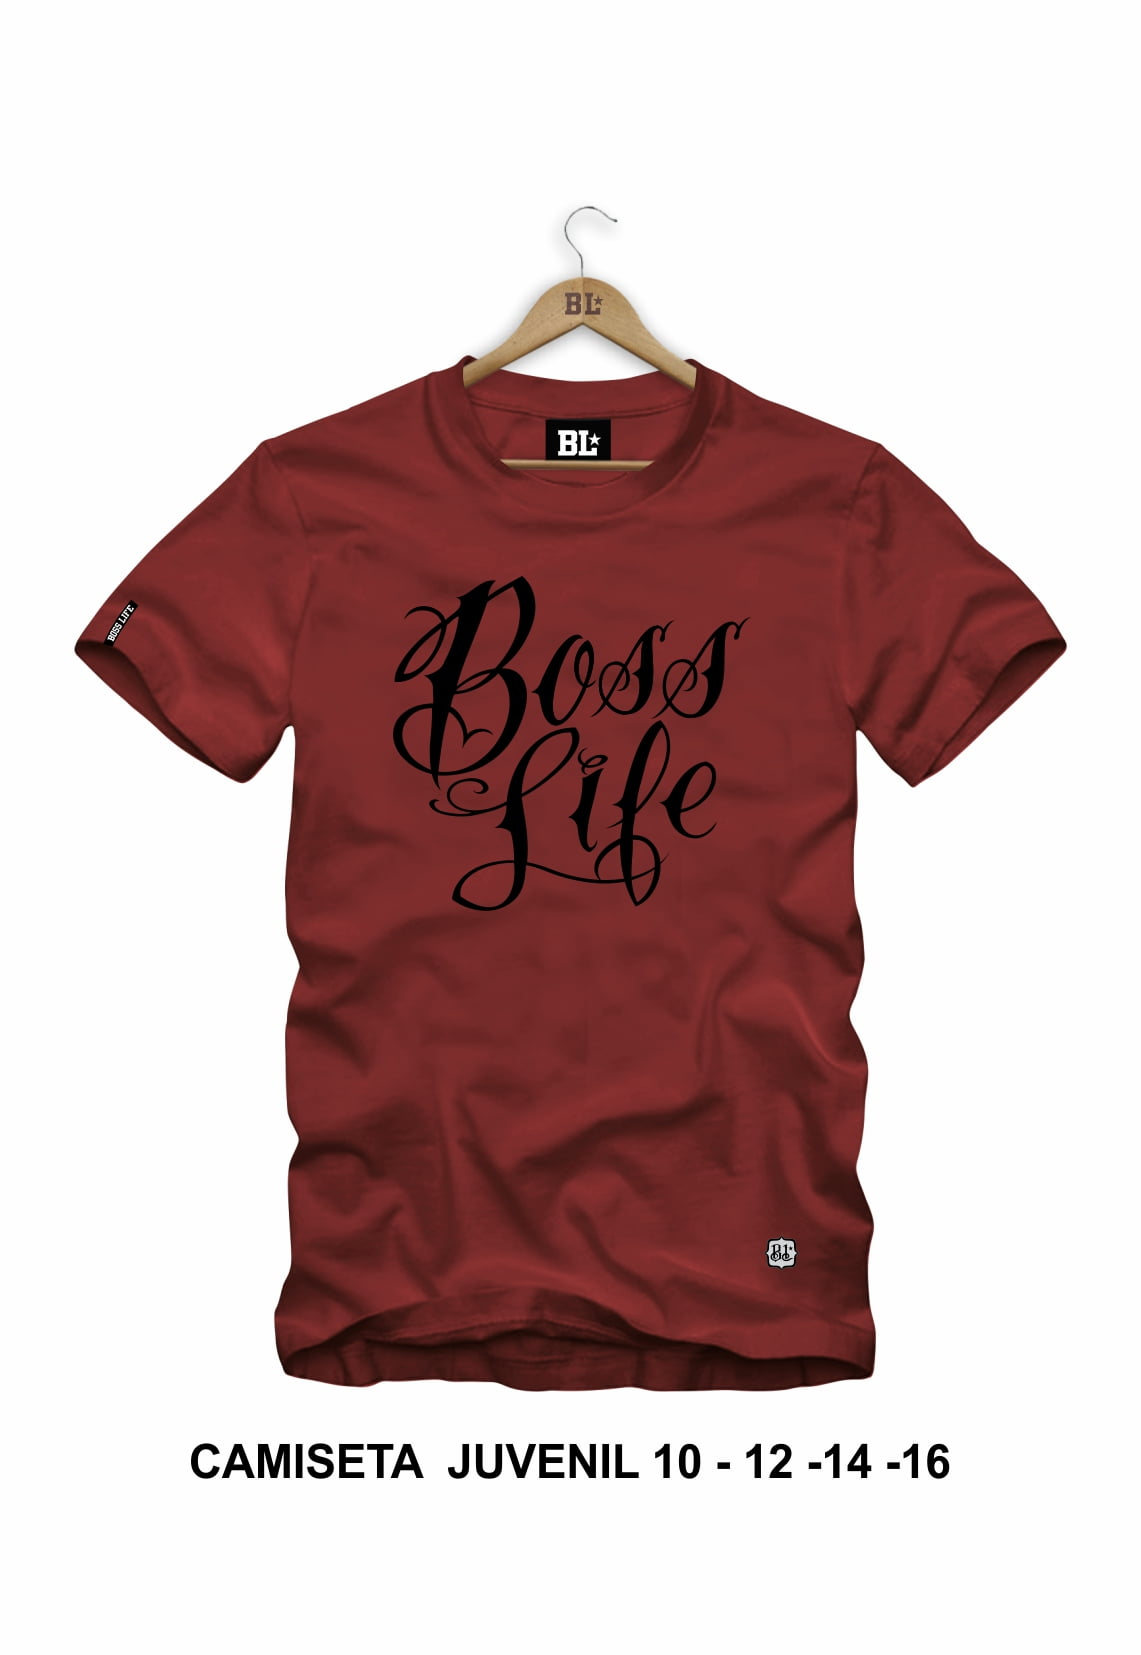 Camiseta Juvenil Boss Life